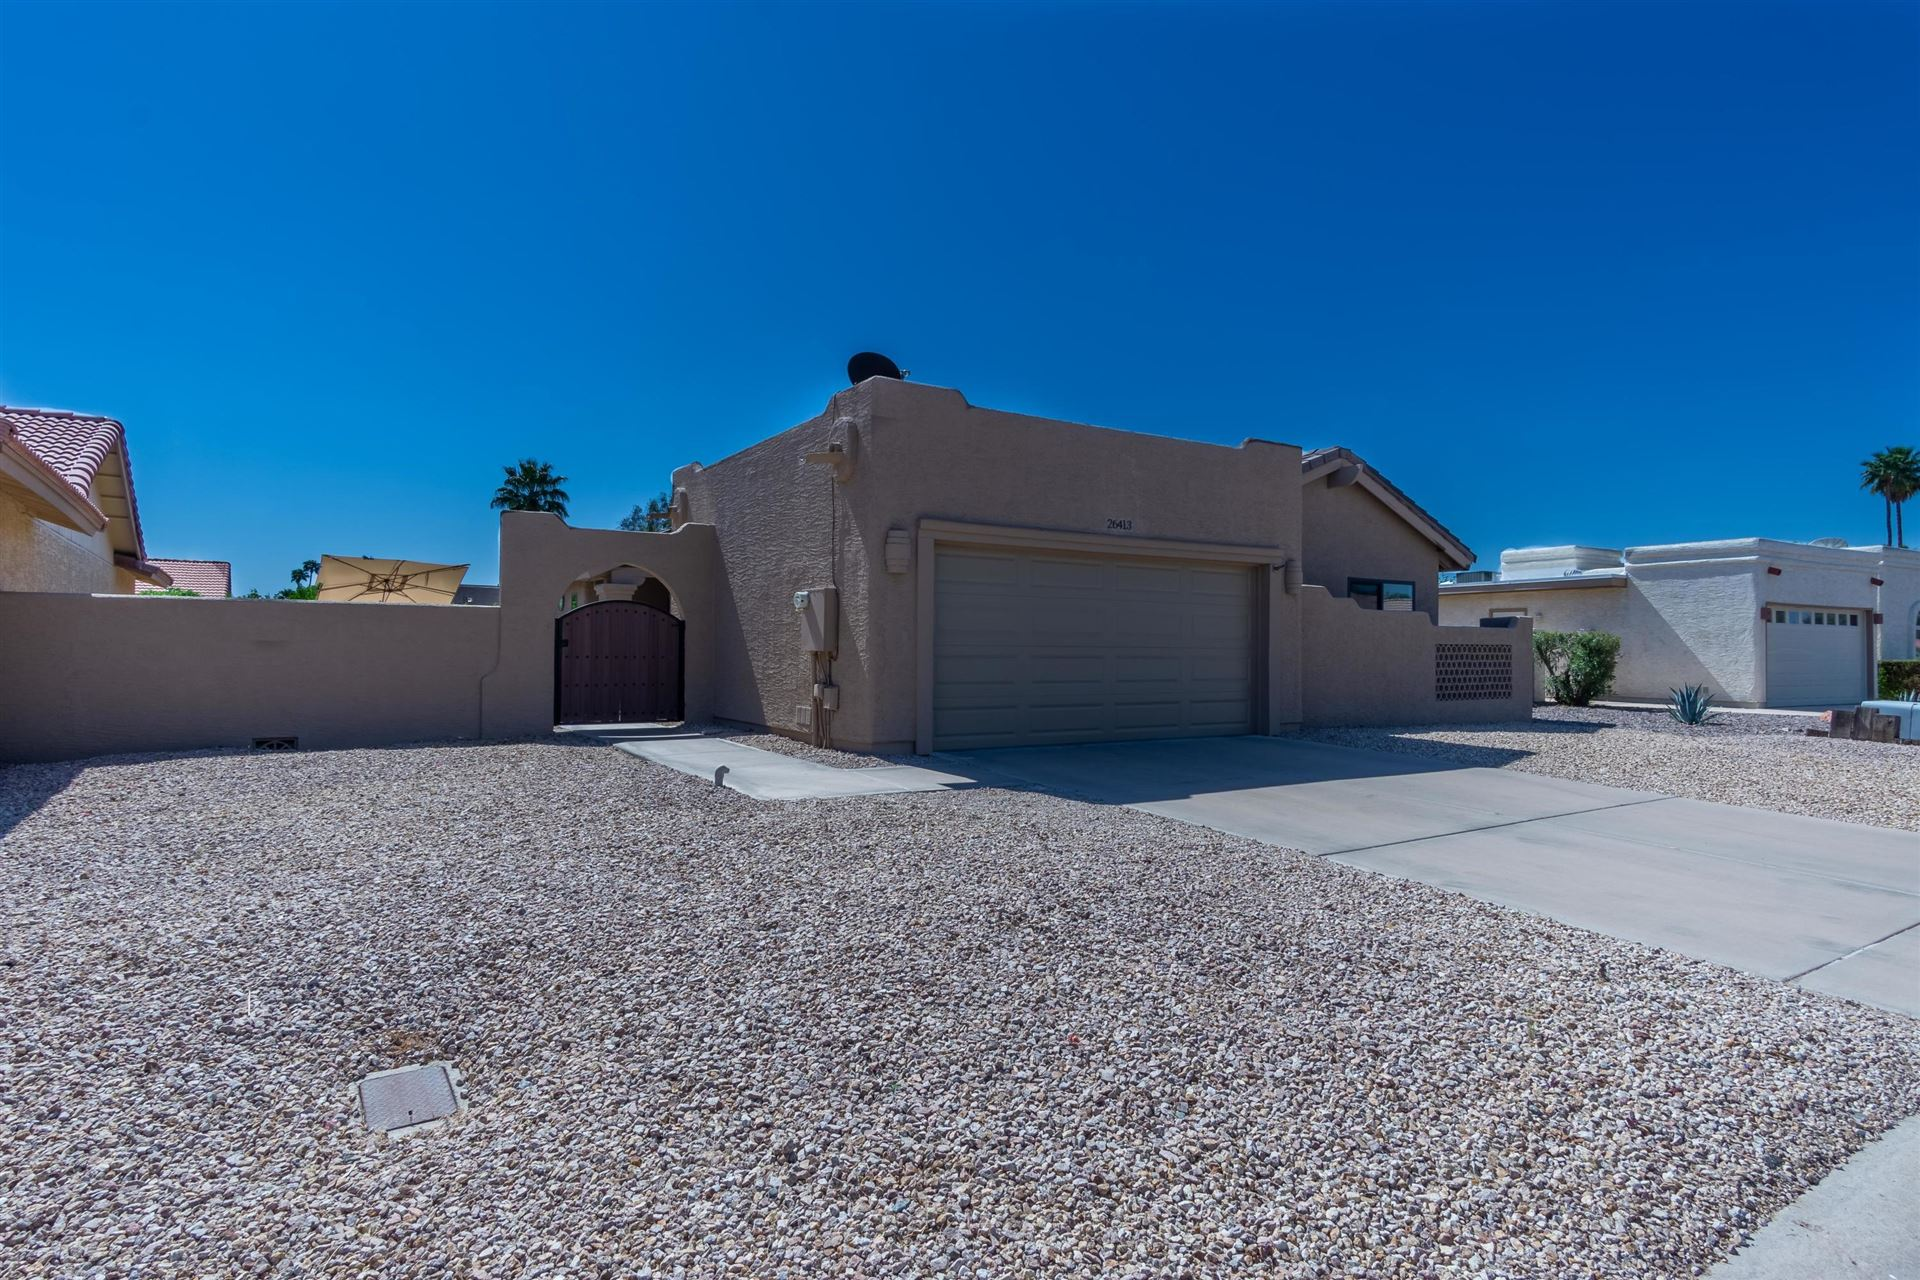 Photo of 26413 S BEECH CREEK Drive, Sun Lakes, AZ 85248 (MLS # 6222994)